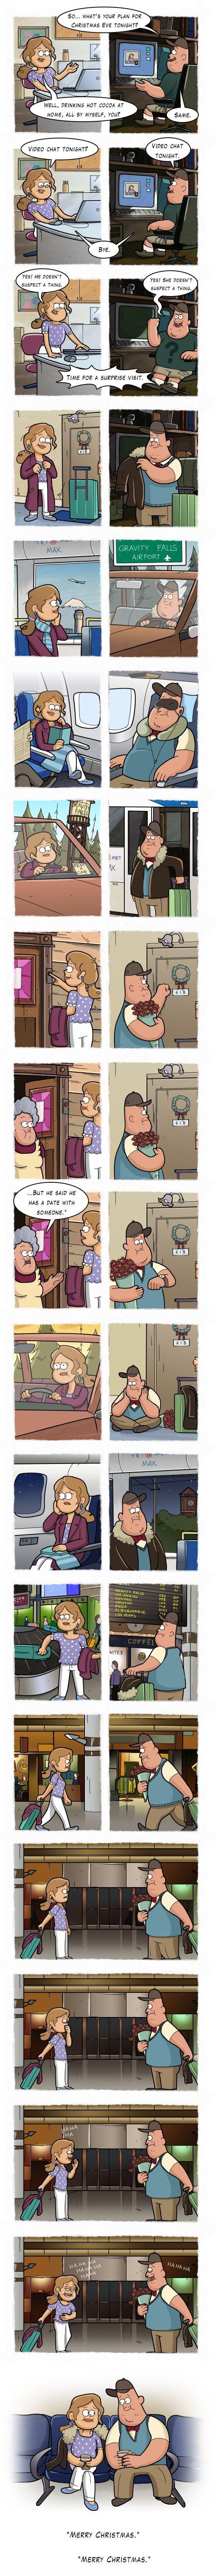 Gravity Falls: